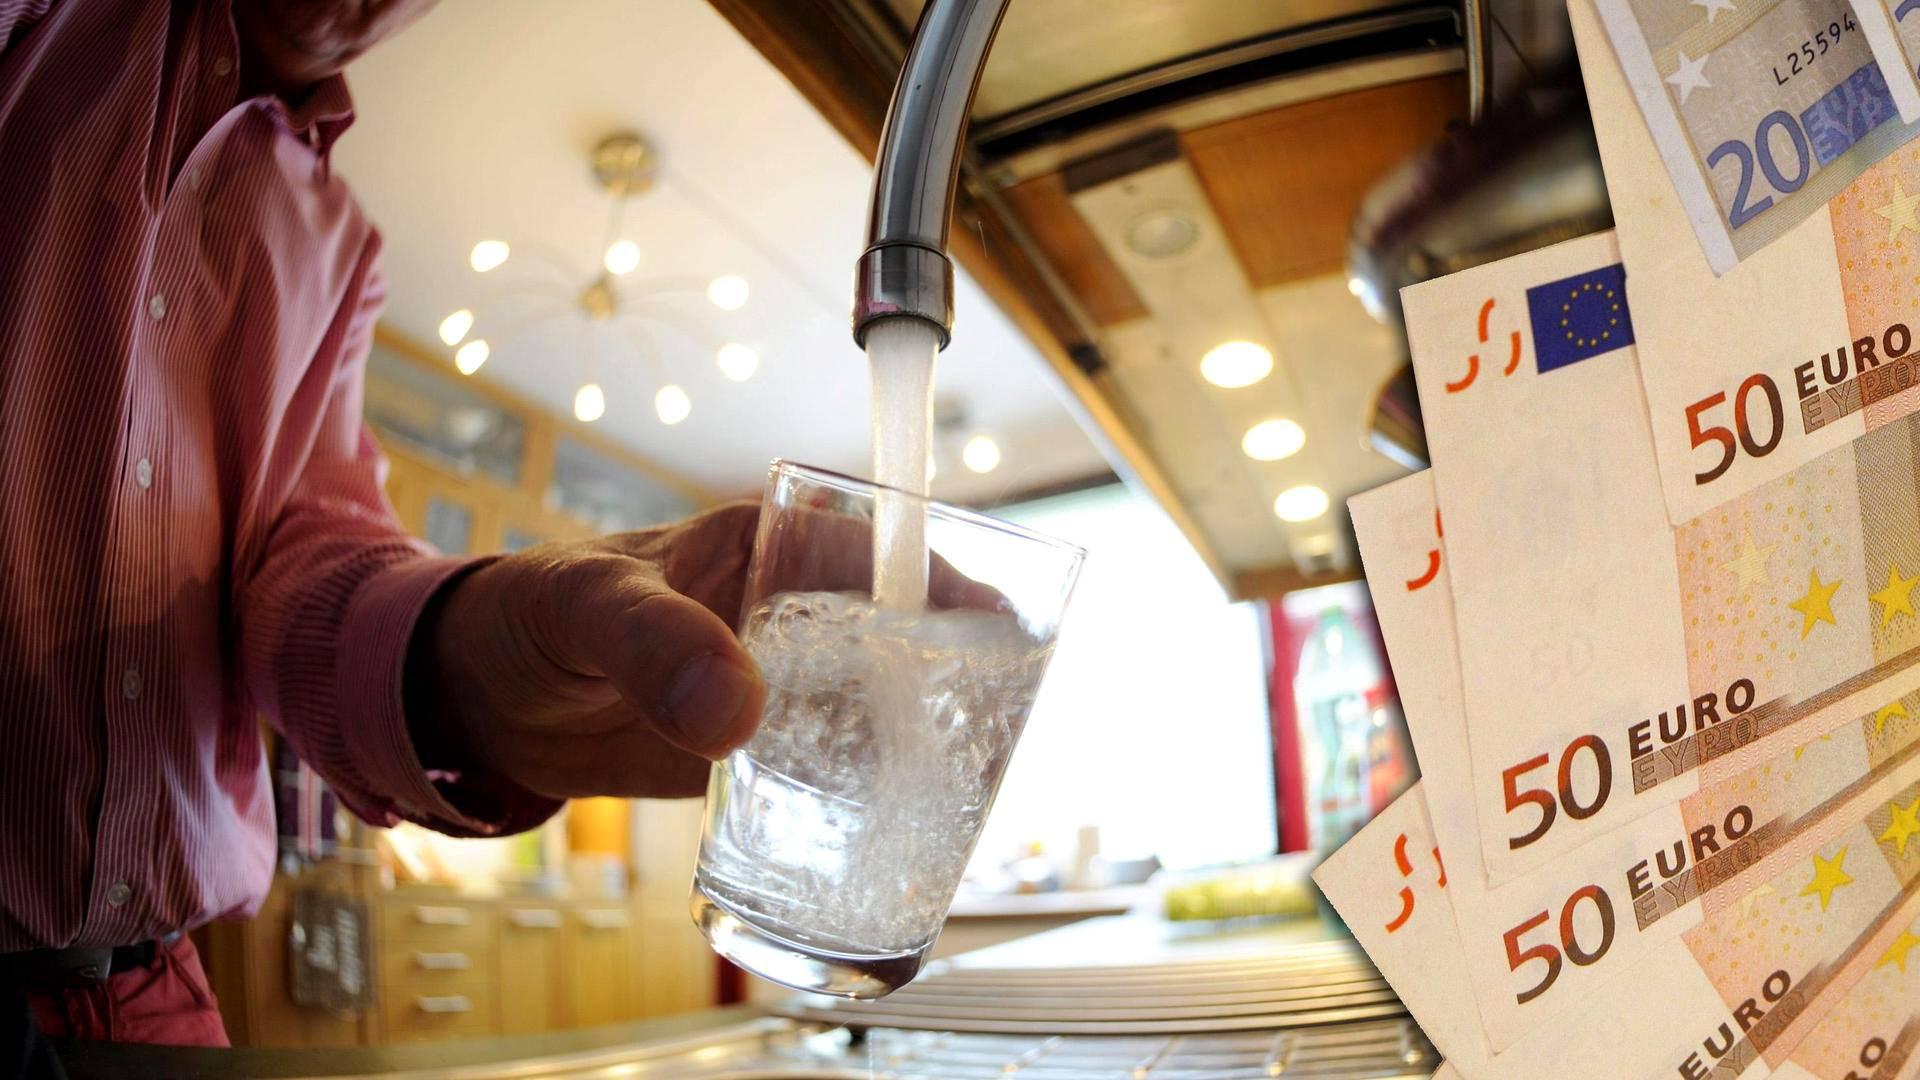 Vedenkulutus Per Henkilö